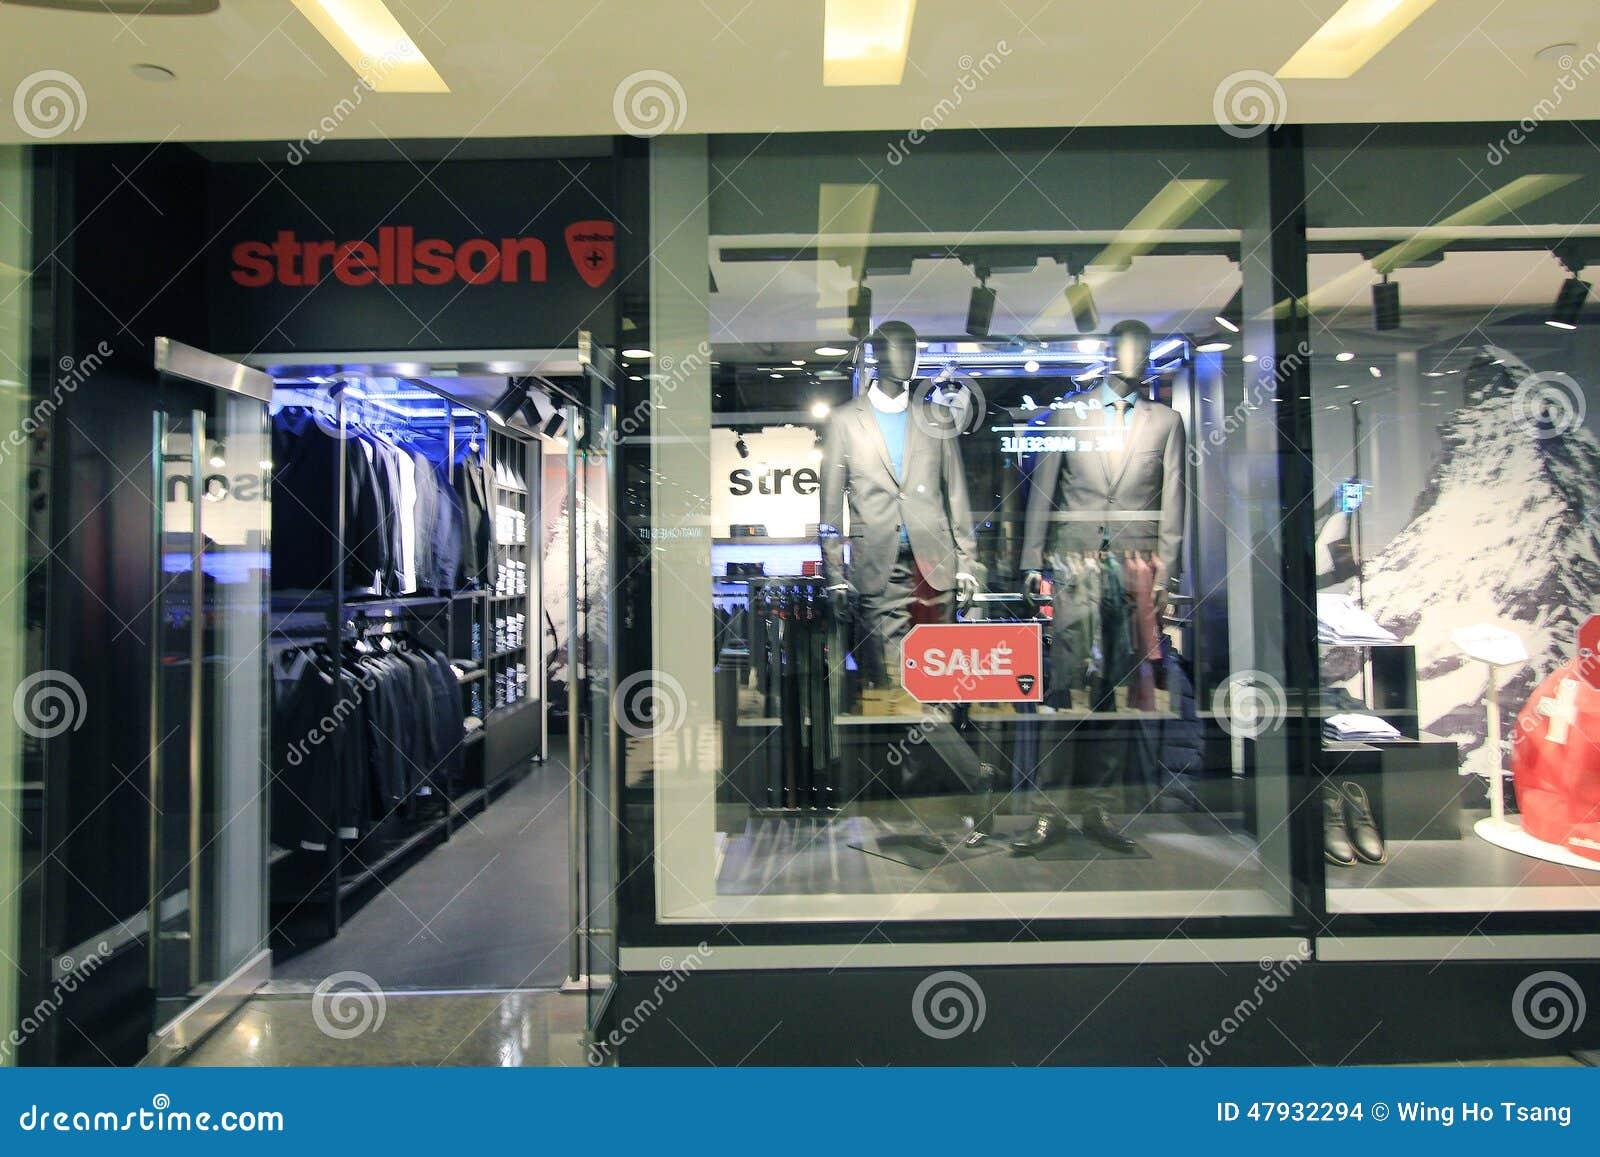 new styles 9da16 31fbf Strellson Shop In Hong Kong Editorial Stock Image - Image of ...